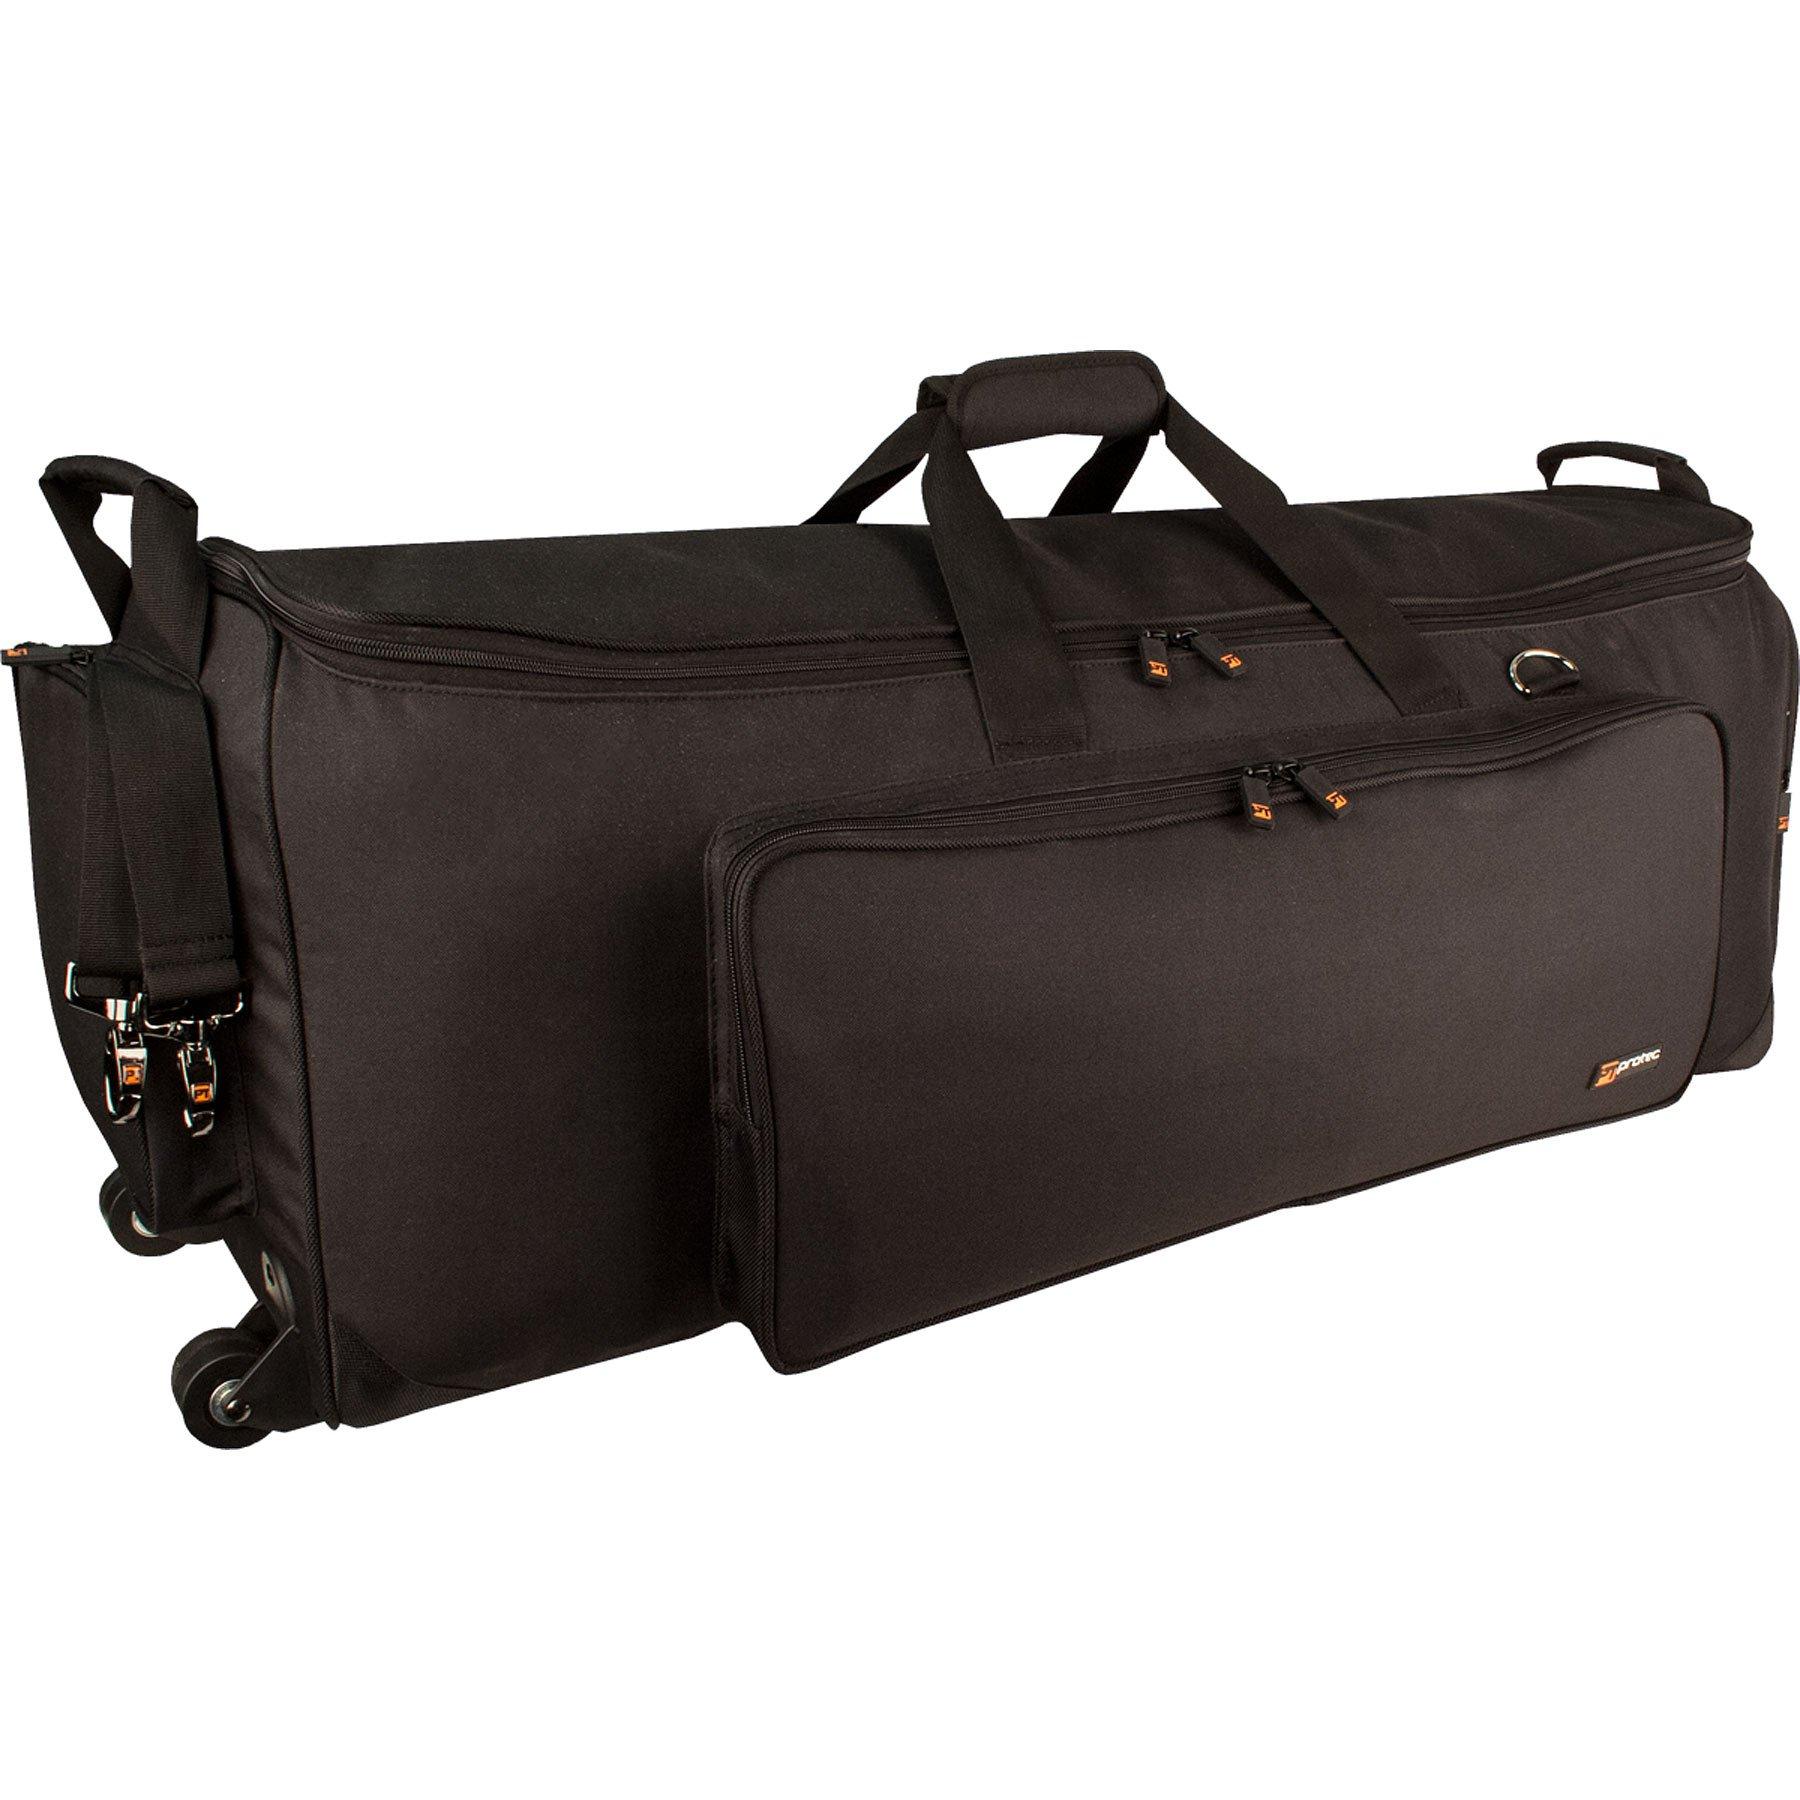 Pro Tec CP205WL Protec CP205WL 36'' Hardware Bag with Wheels